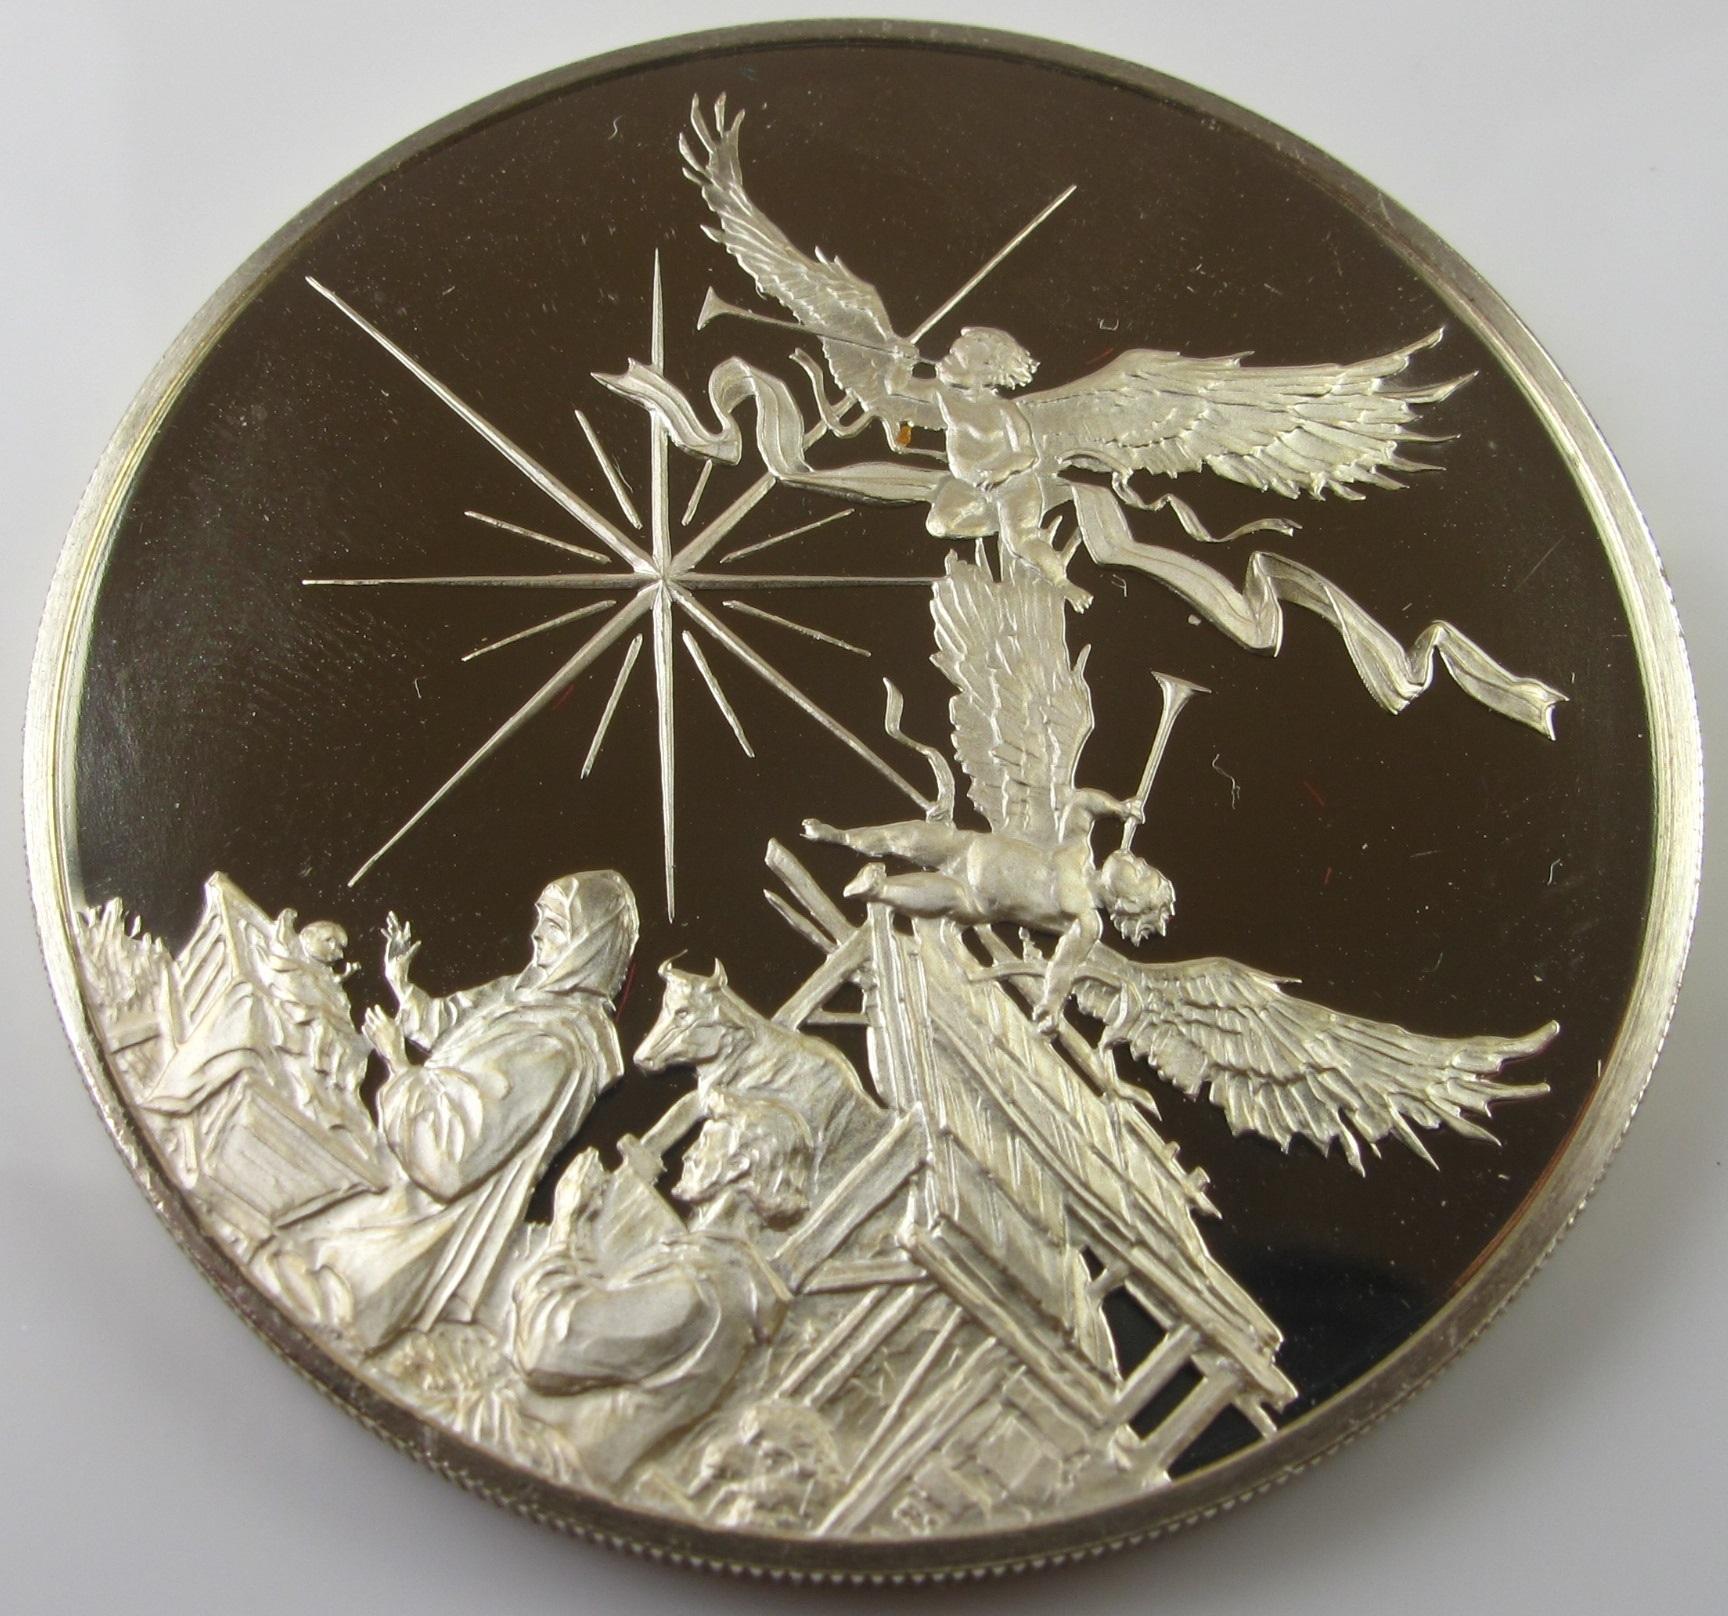 Vintage 1972 Sterling Silver Round Bullion - Birth of Christ